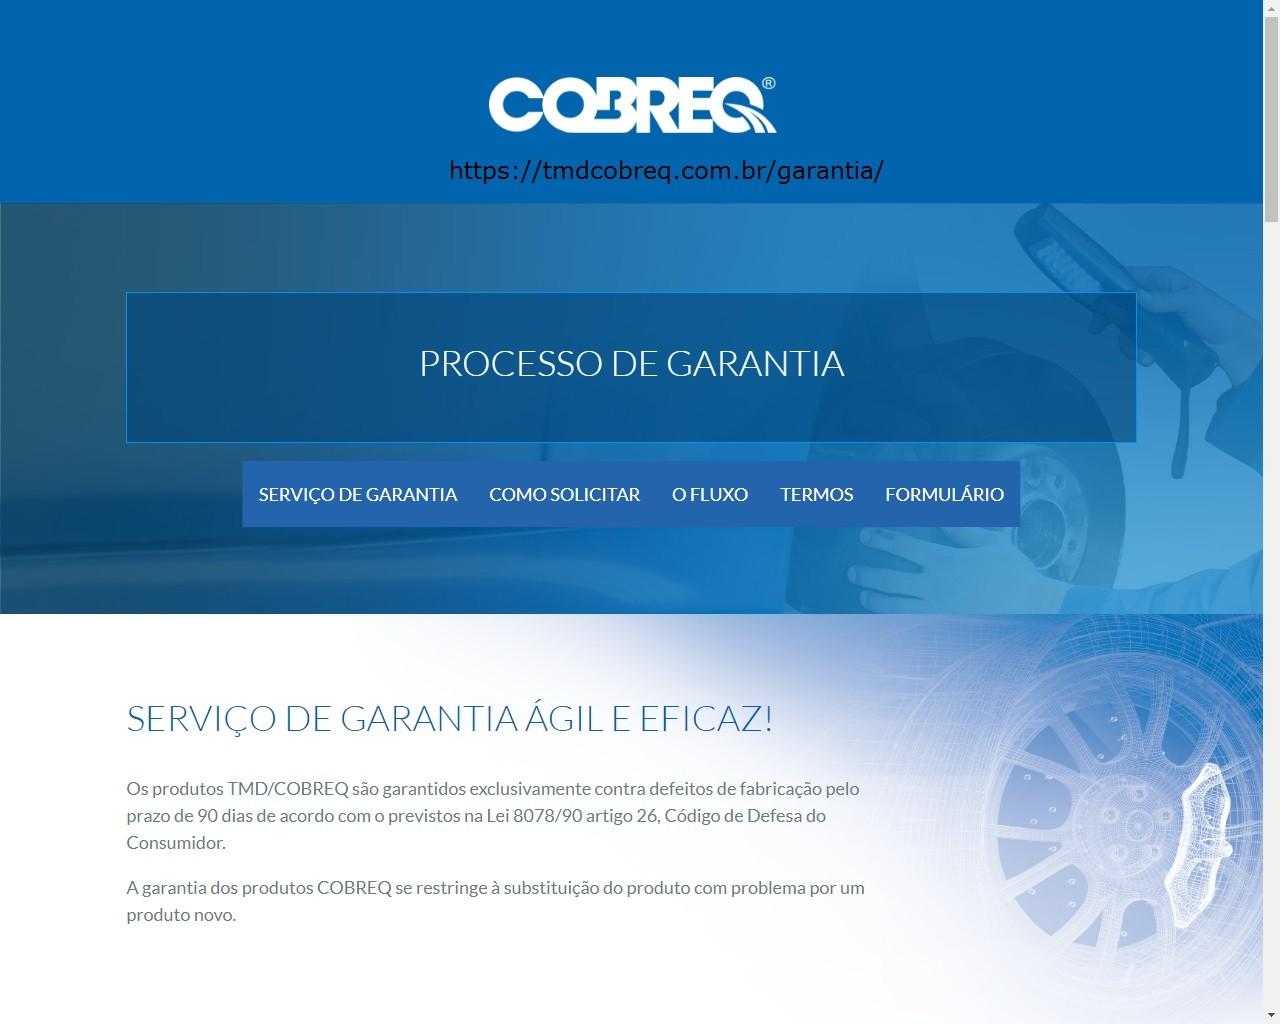 Pastilha Freio Cerâmica Tiger 800 XC/XCX/XRX/XCA Traseira Cobreq Racing Extreme N-1824C